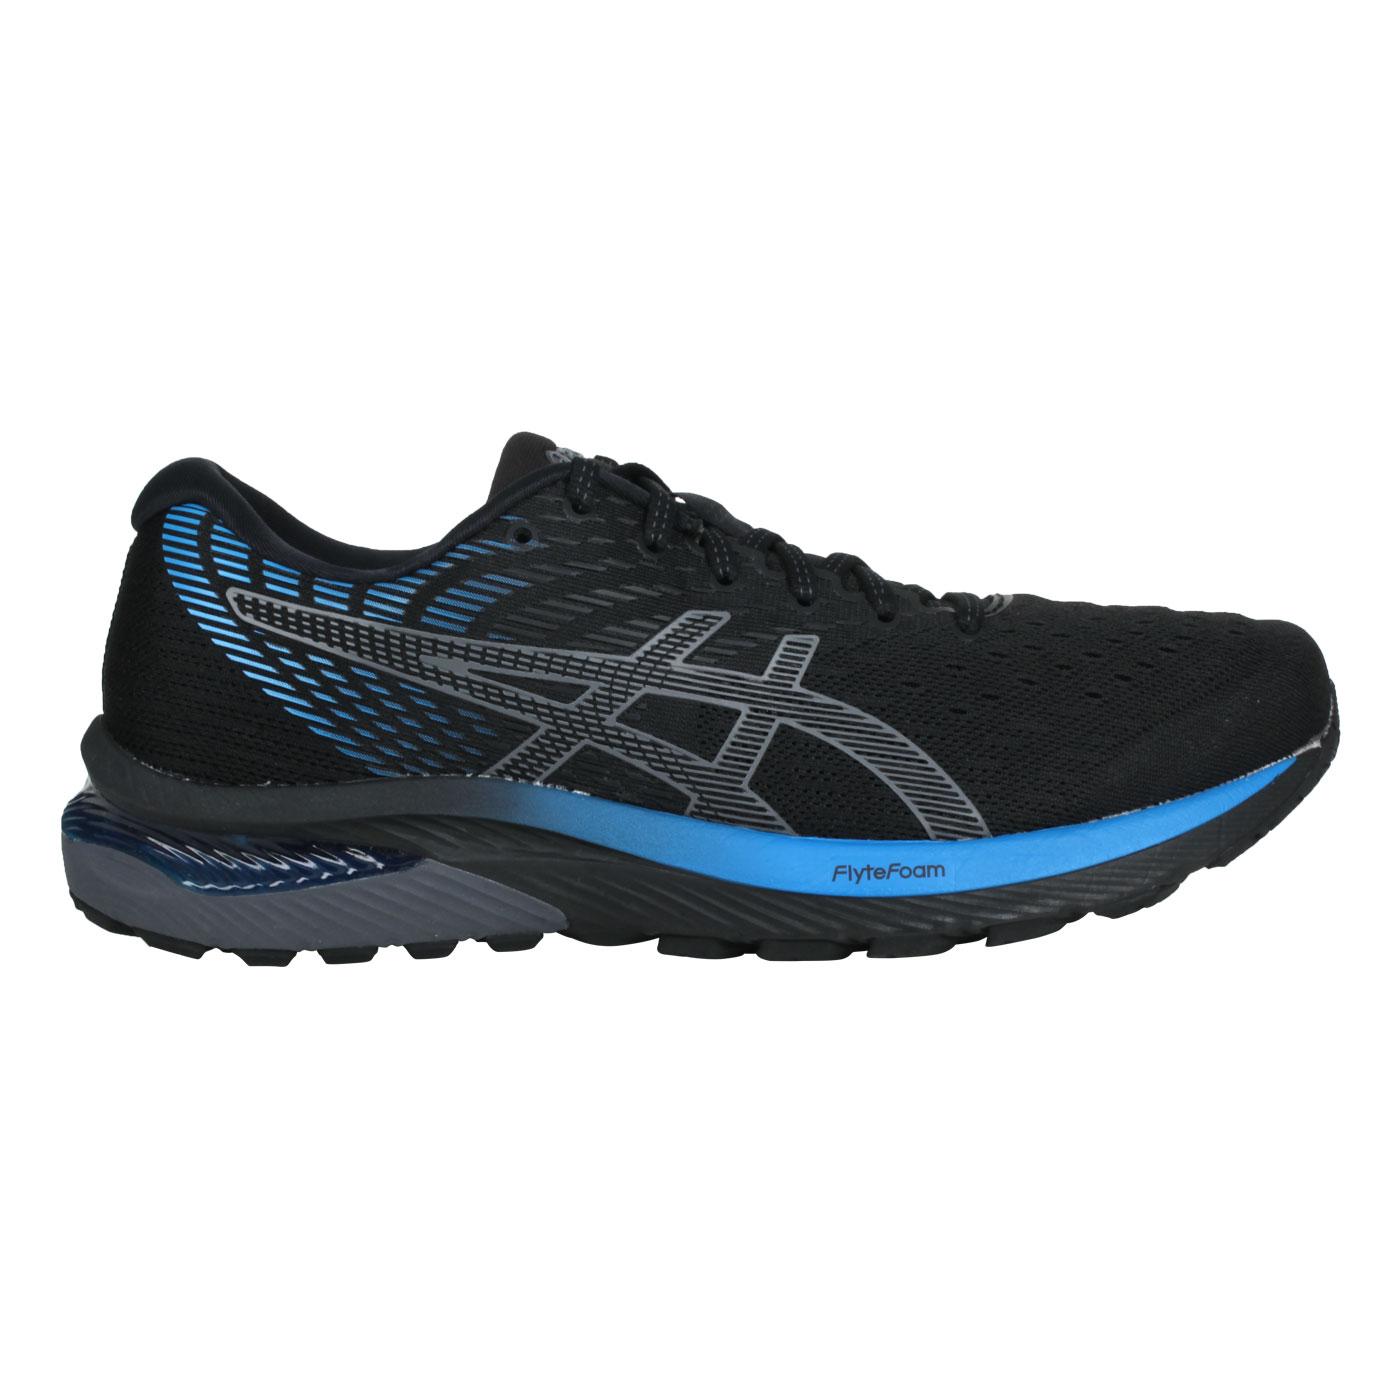 ASICS 男款慢跑鞋  @GEL-CUMULUS 22@1011A862-001 - 黑灰藍